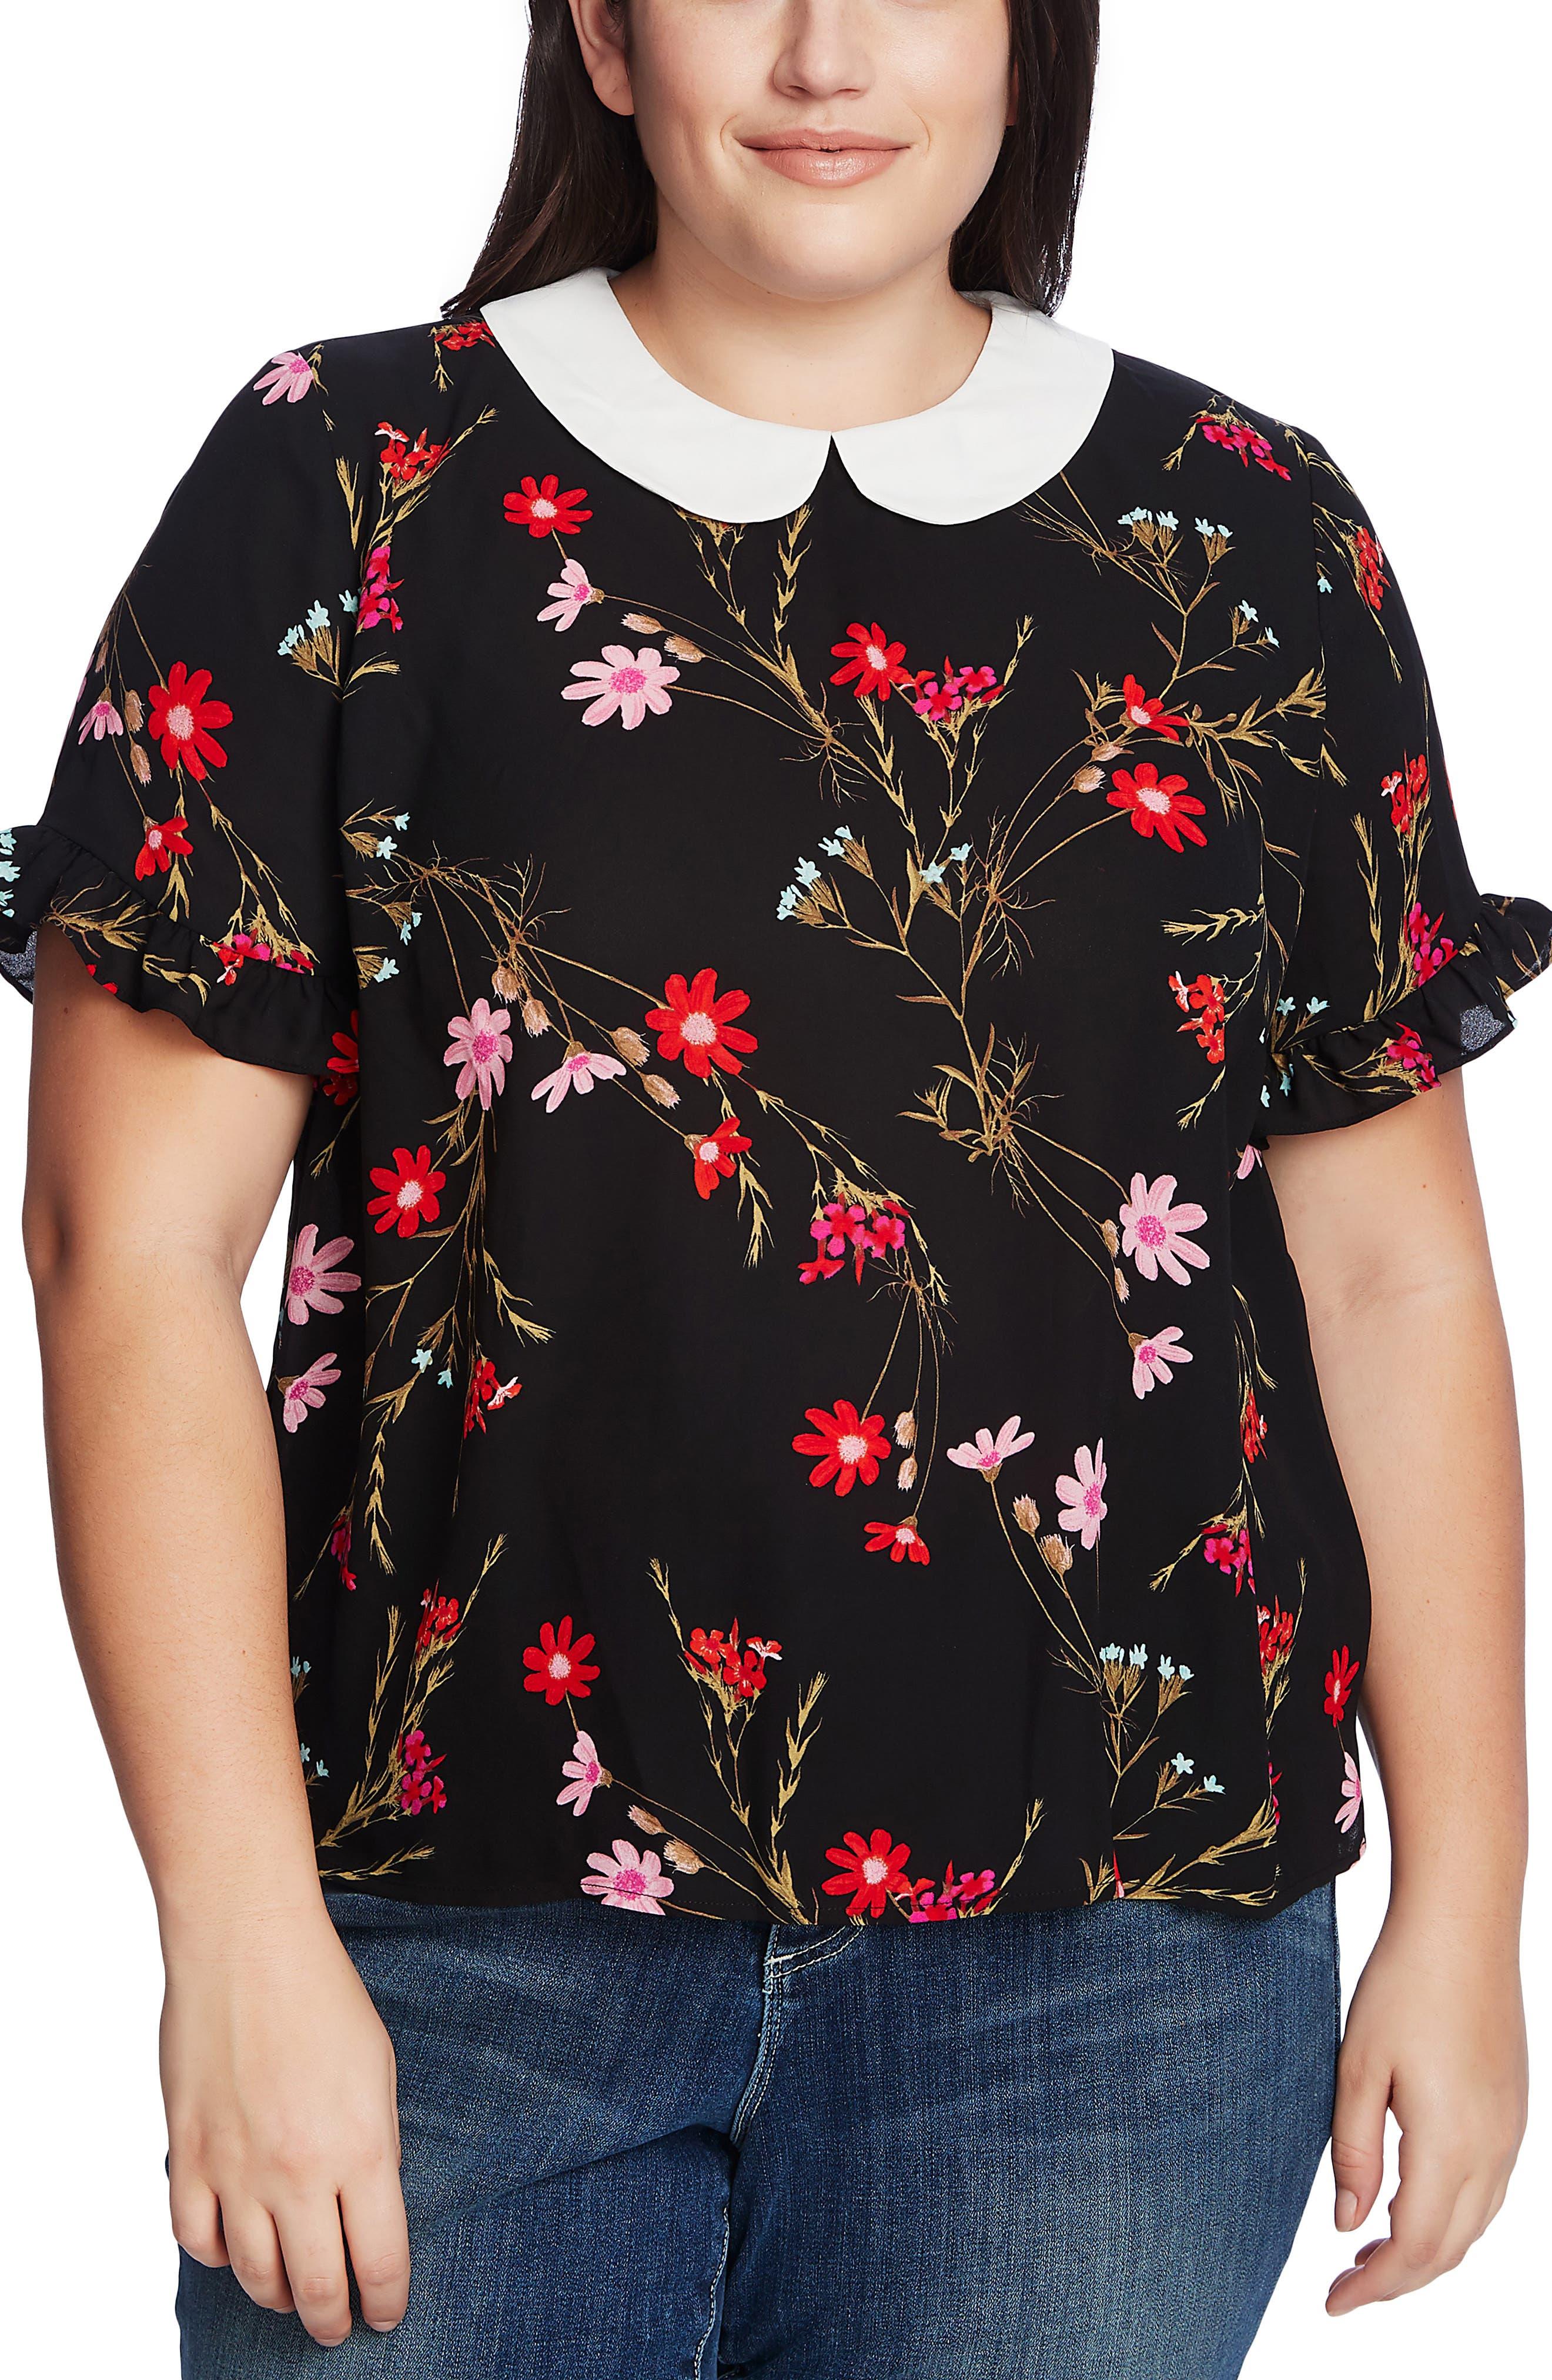 Vintage Tops & Retro Shirts, Halter Tops, Blouses Plus Size Womens Cece Enchanted Wildflower Collar Blouse $41.40 AT vintagedancer.com